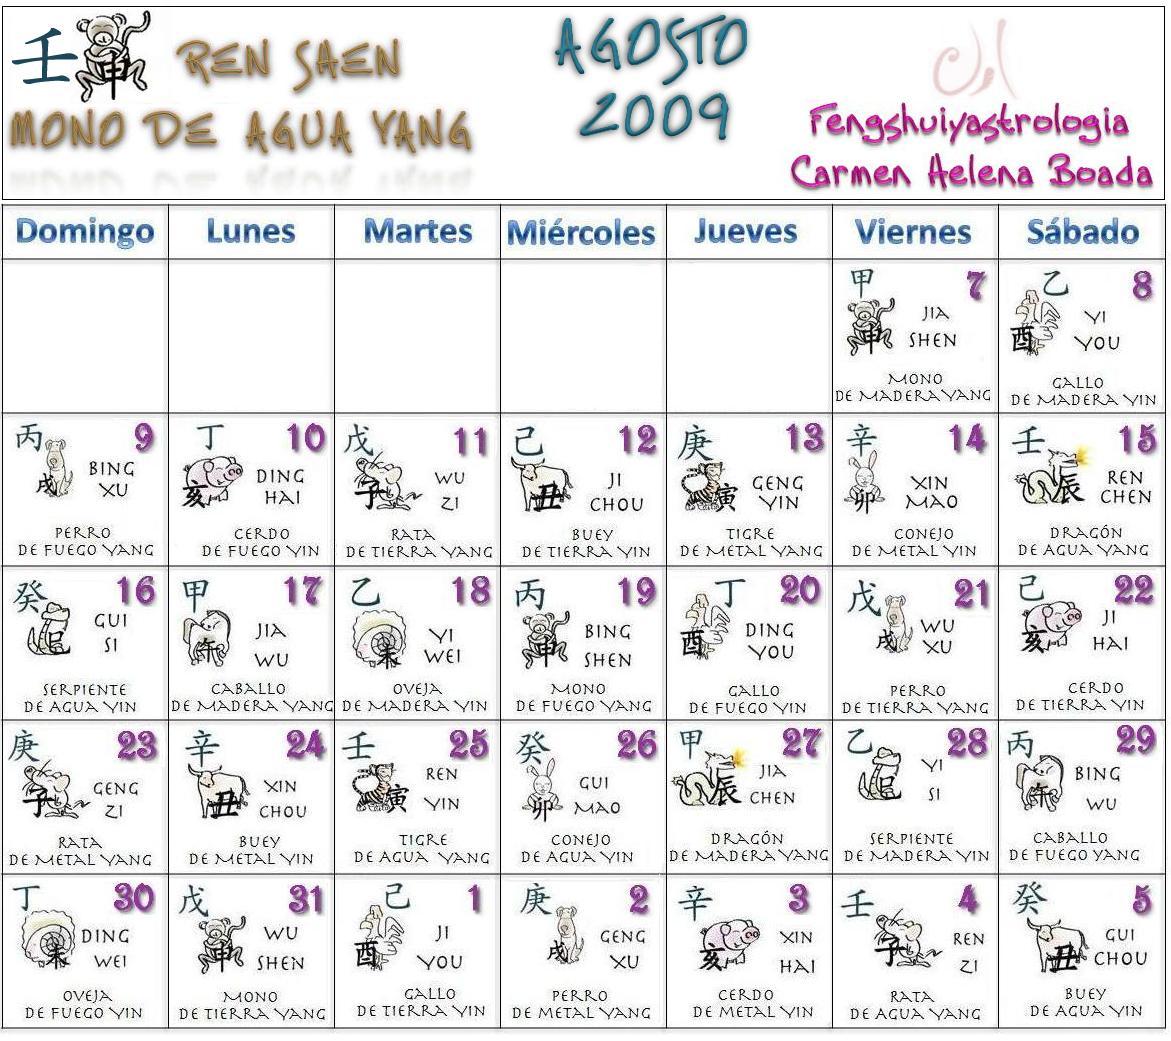 Calendario Chino.Calendario Chino Agosto 2009 Astrologia China Bazi